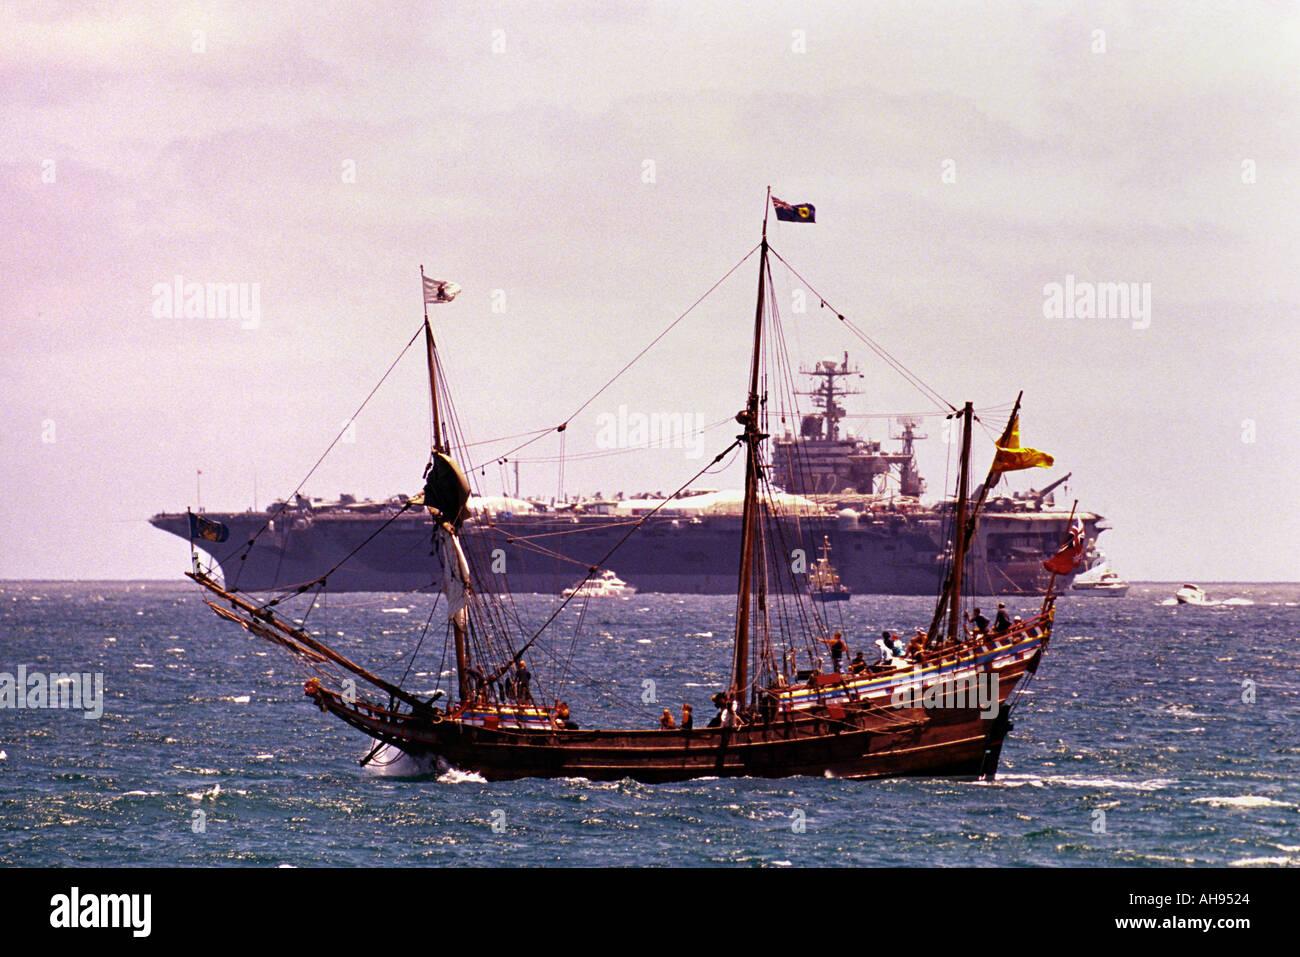 Abraham Lincoln carrier and Duvken replica Fremantle Western Australia - Stock Image